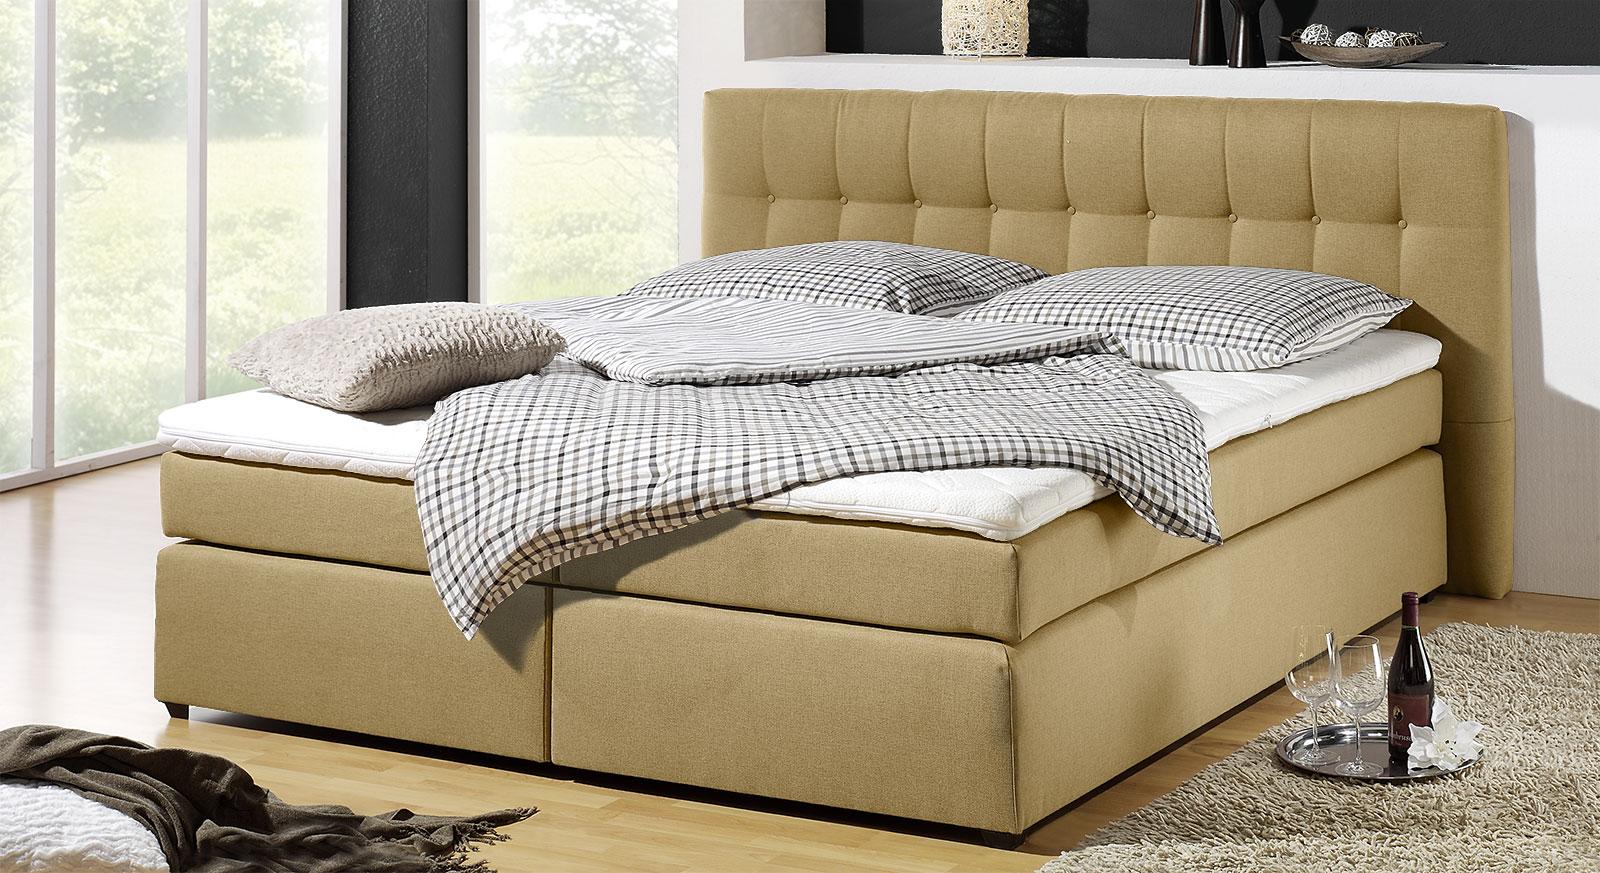 Spring-Box-Bett Chicago mit jutefarbenem Stoffbezug